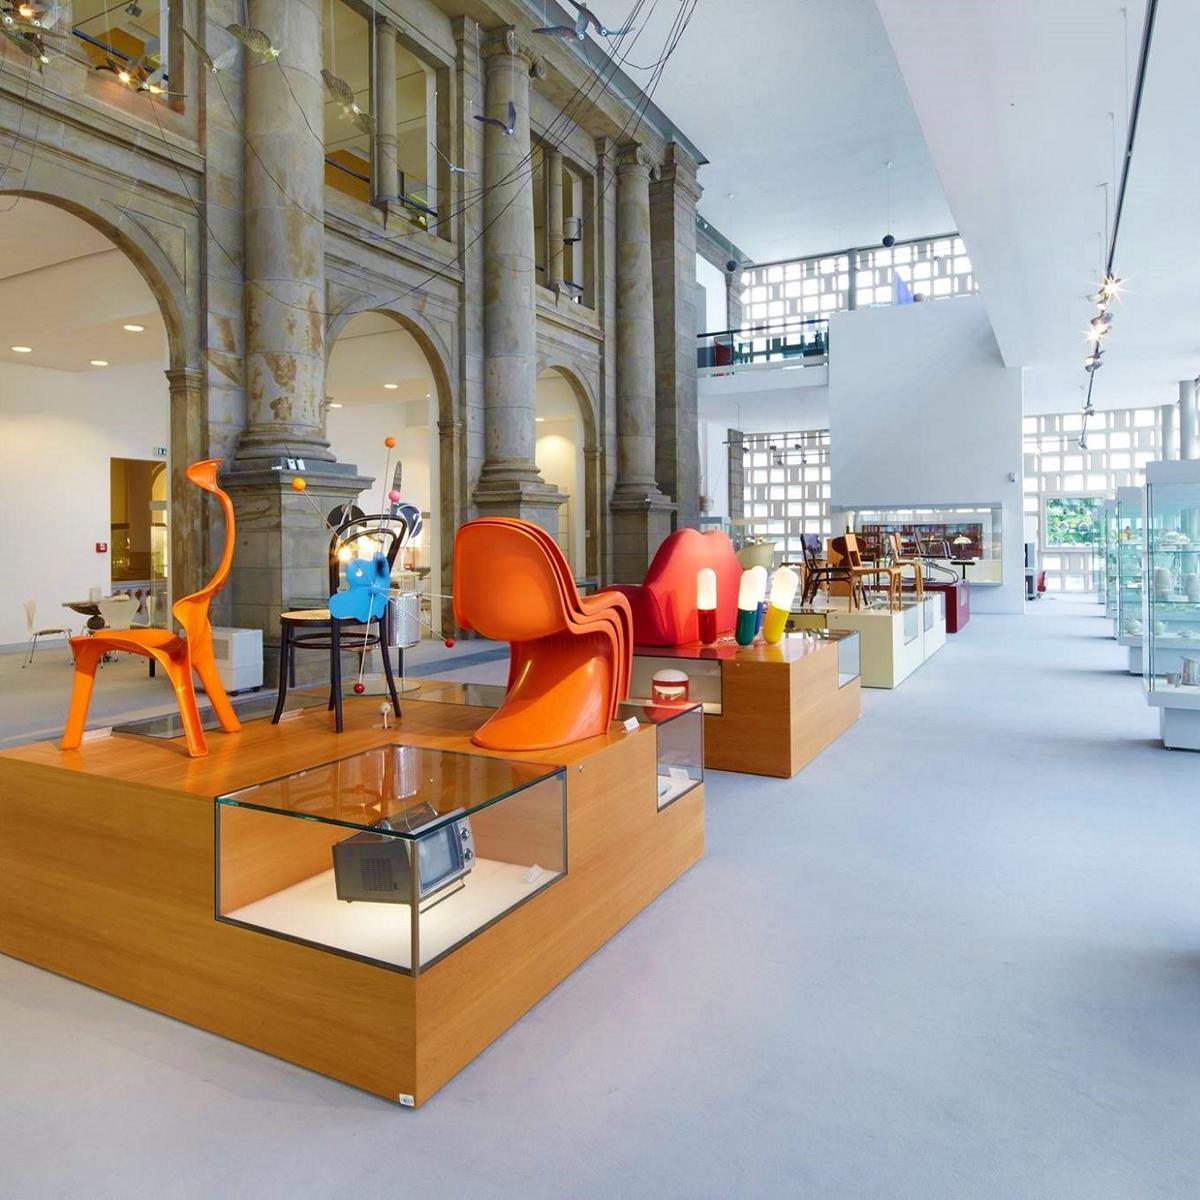 Style Hannover Museum August Kestner 1 - Museum August Kestner